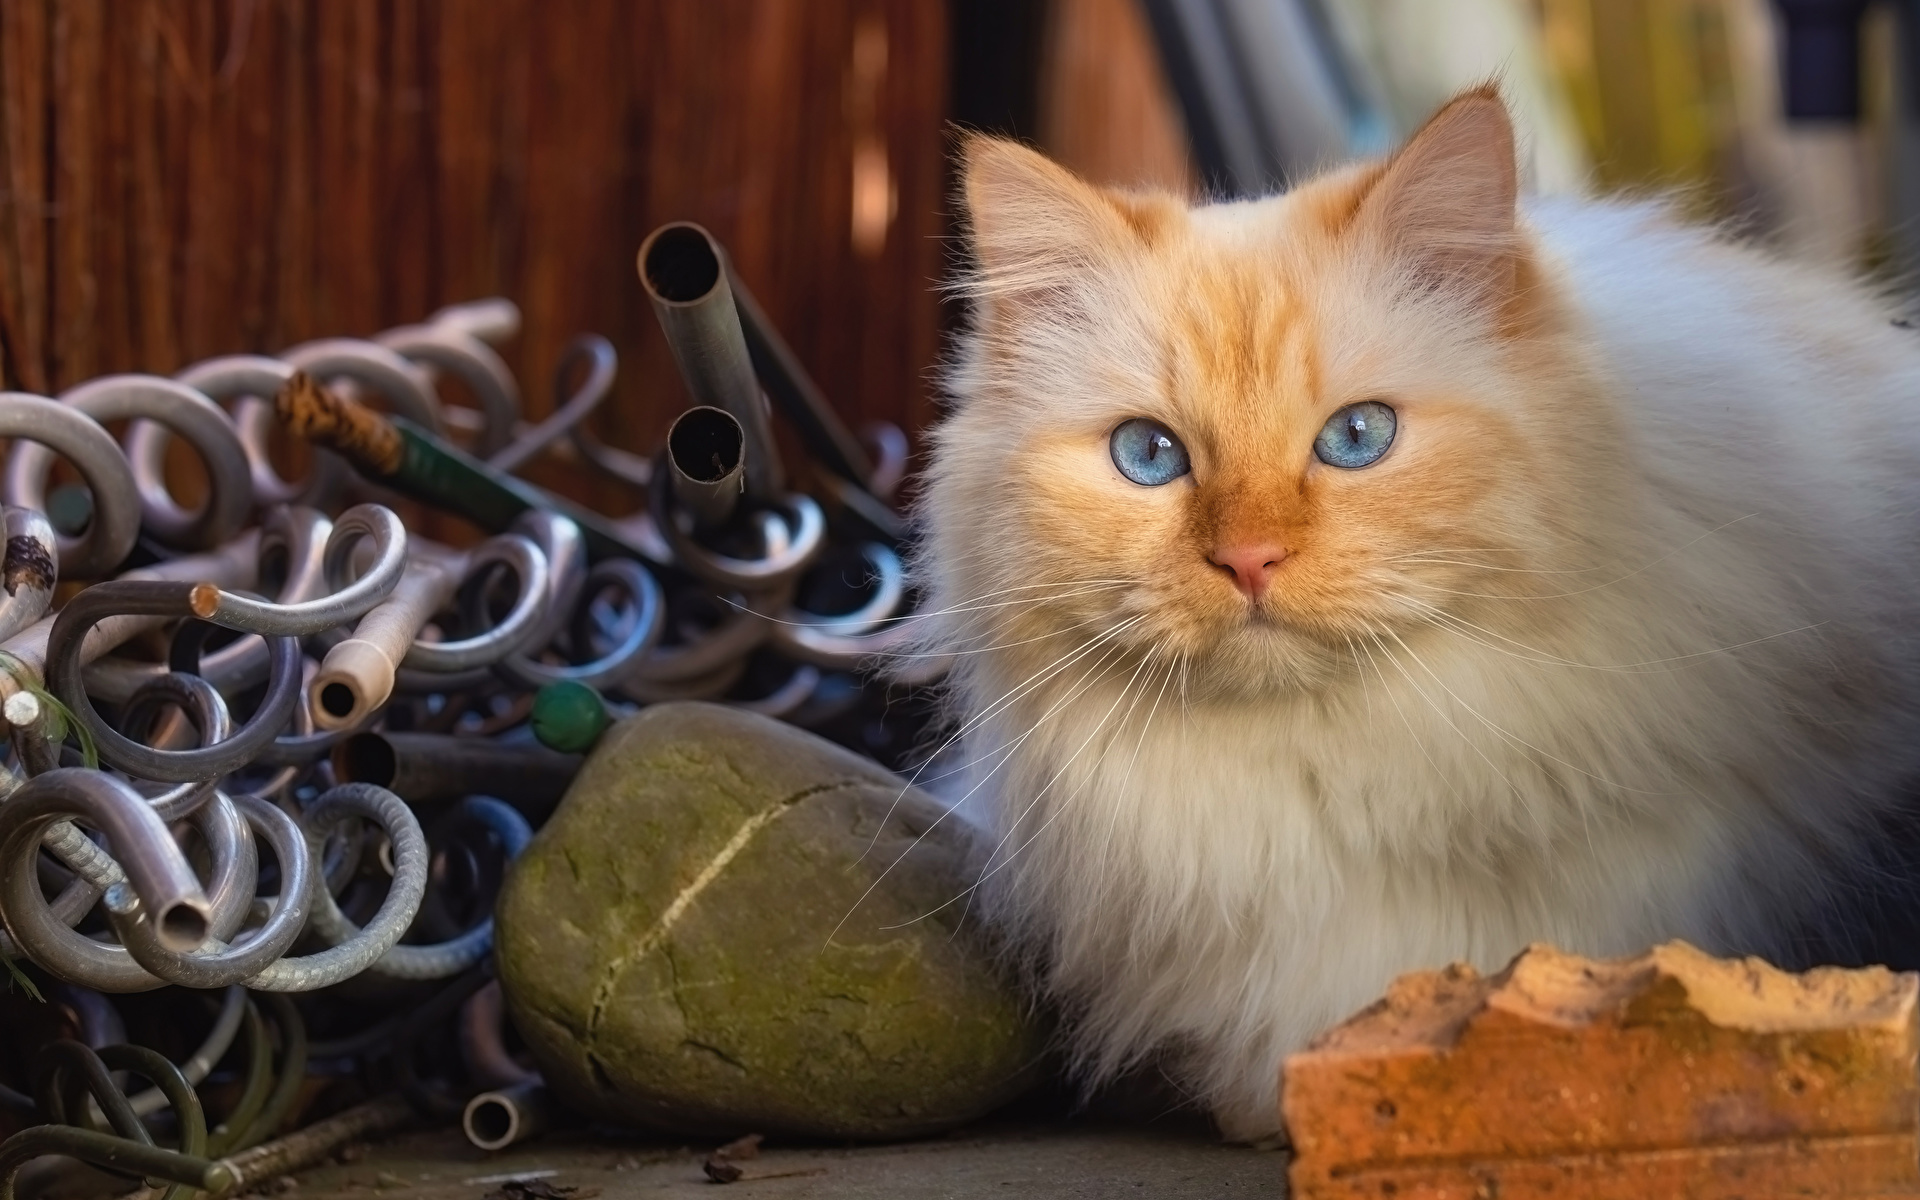 Fotos von Katzen Blick Tiere 1920x1200 Katze Hauskatze Starren ein Tier